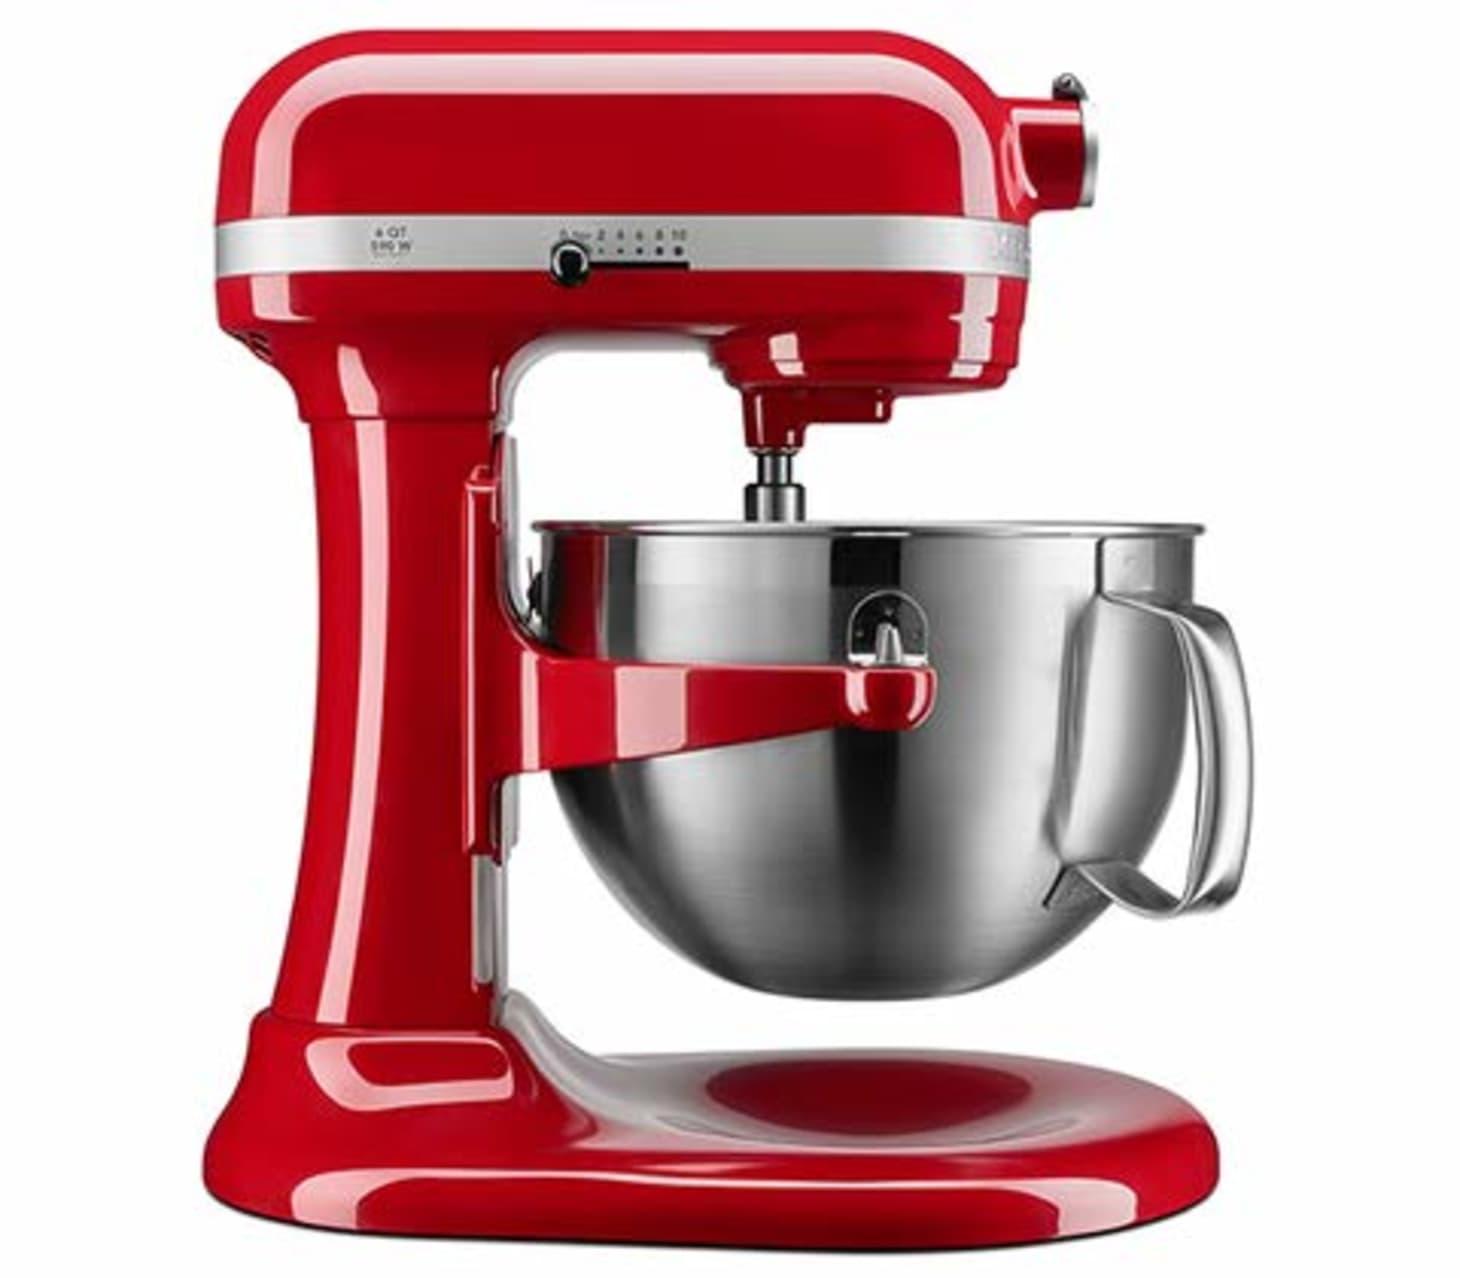 Kitchen Aid Stand Mixer Sale on Amazon | Kitchn